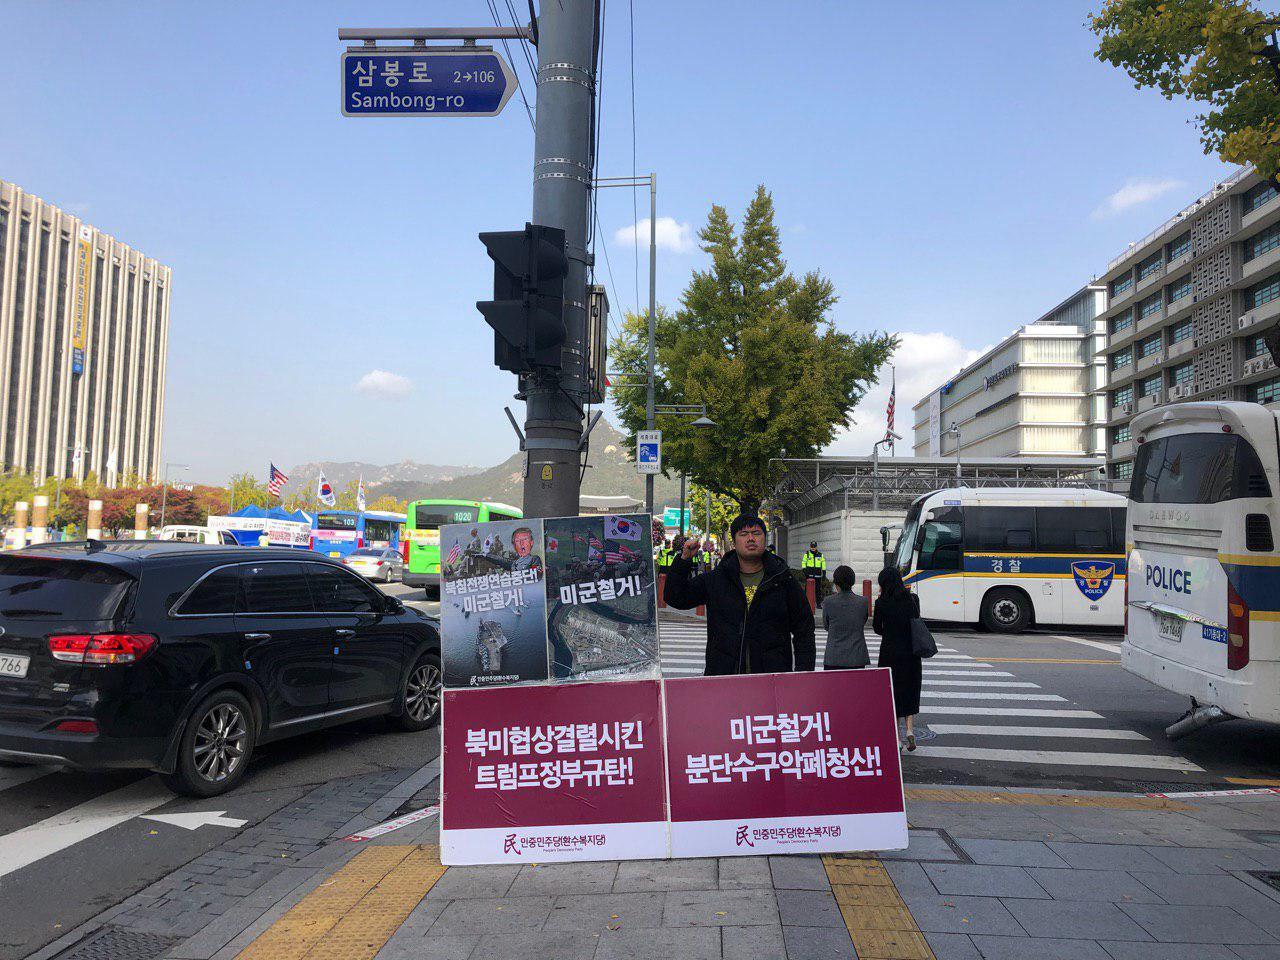 photo_2019-10-29_05-46-42.jpg